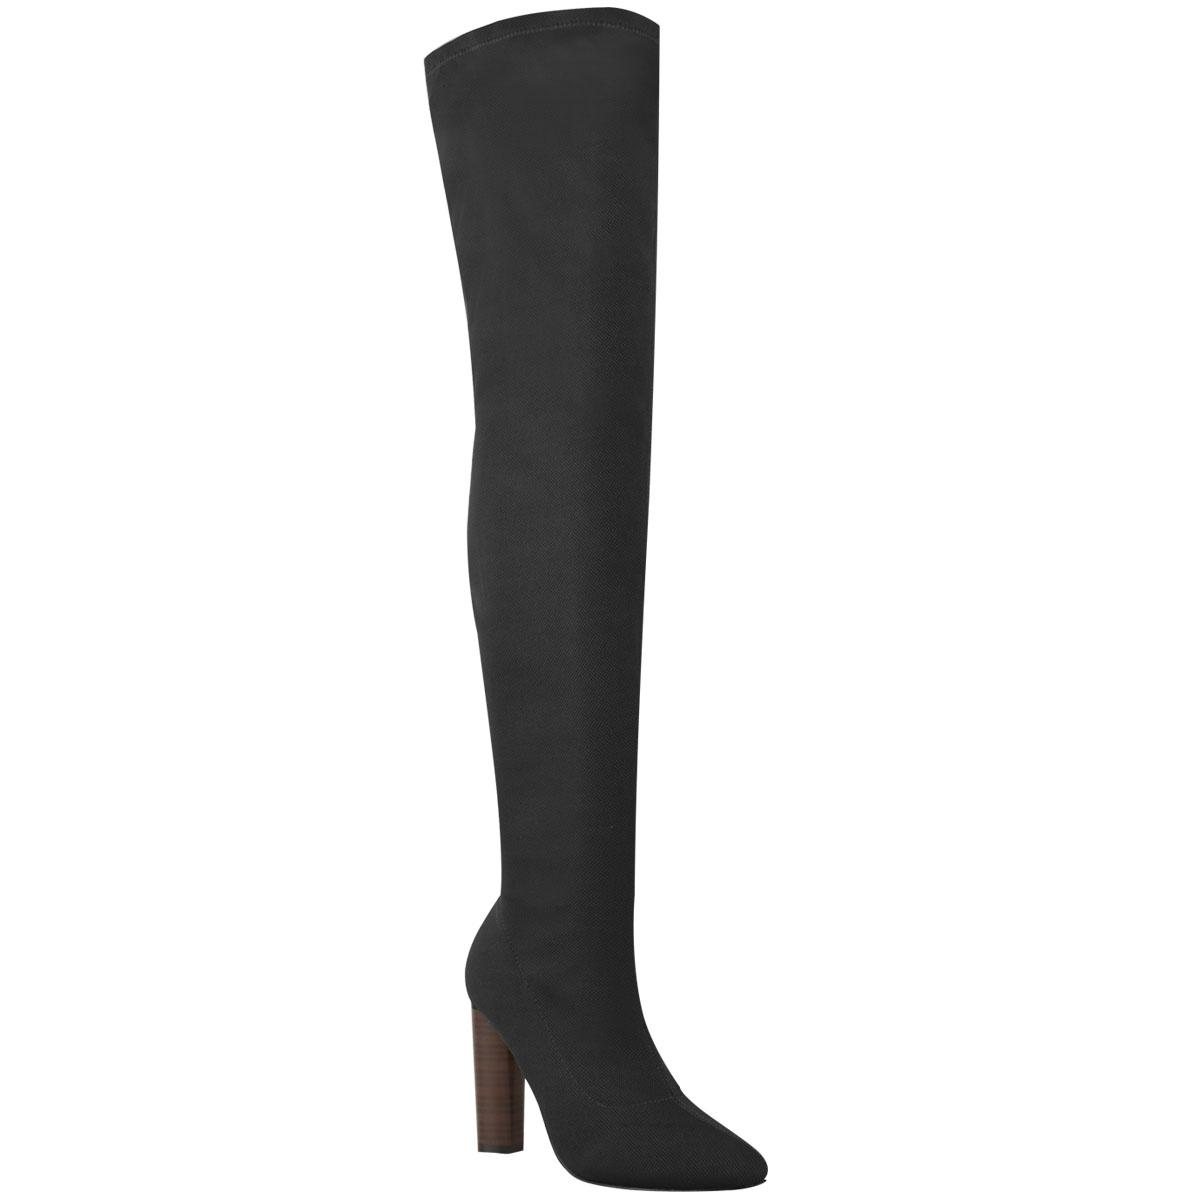 Mujer Ladies Thigh High Stretch Lycra botas botas Lycra Over The Knee Celeb High Heels Talla 4d5d92